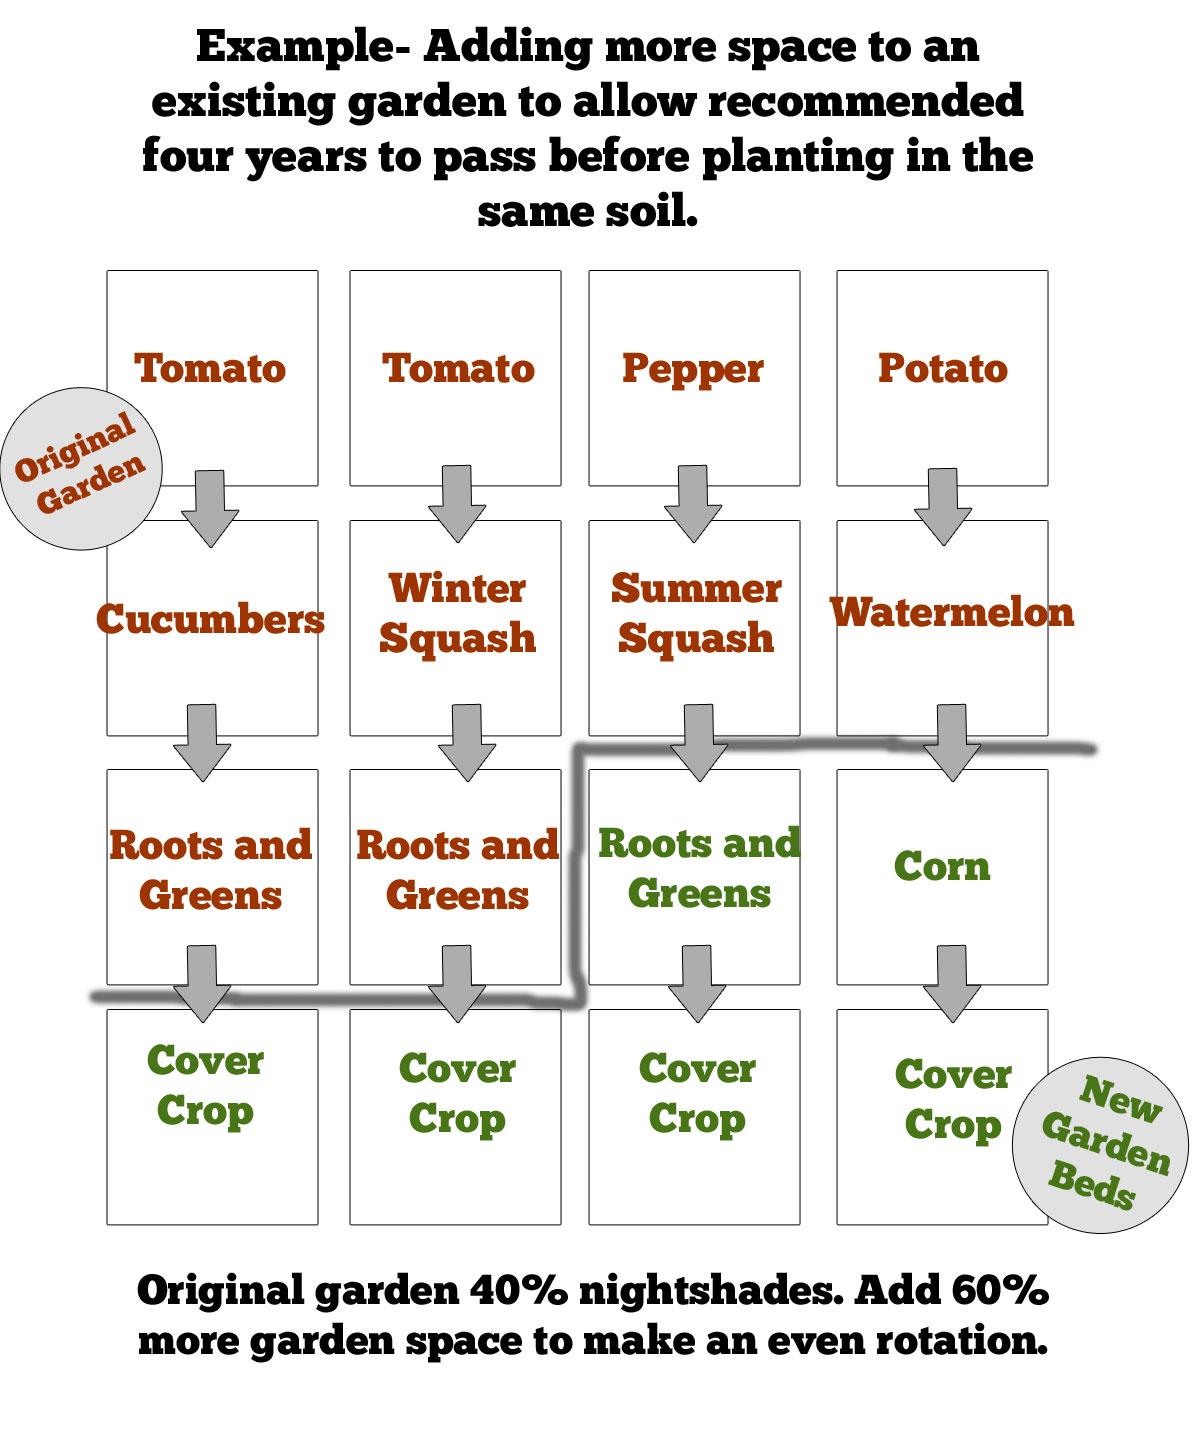 crop-rotation-tomatoes.jpg